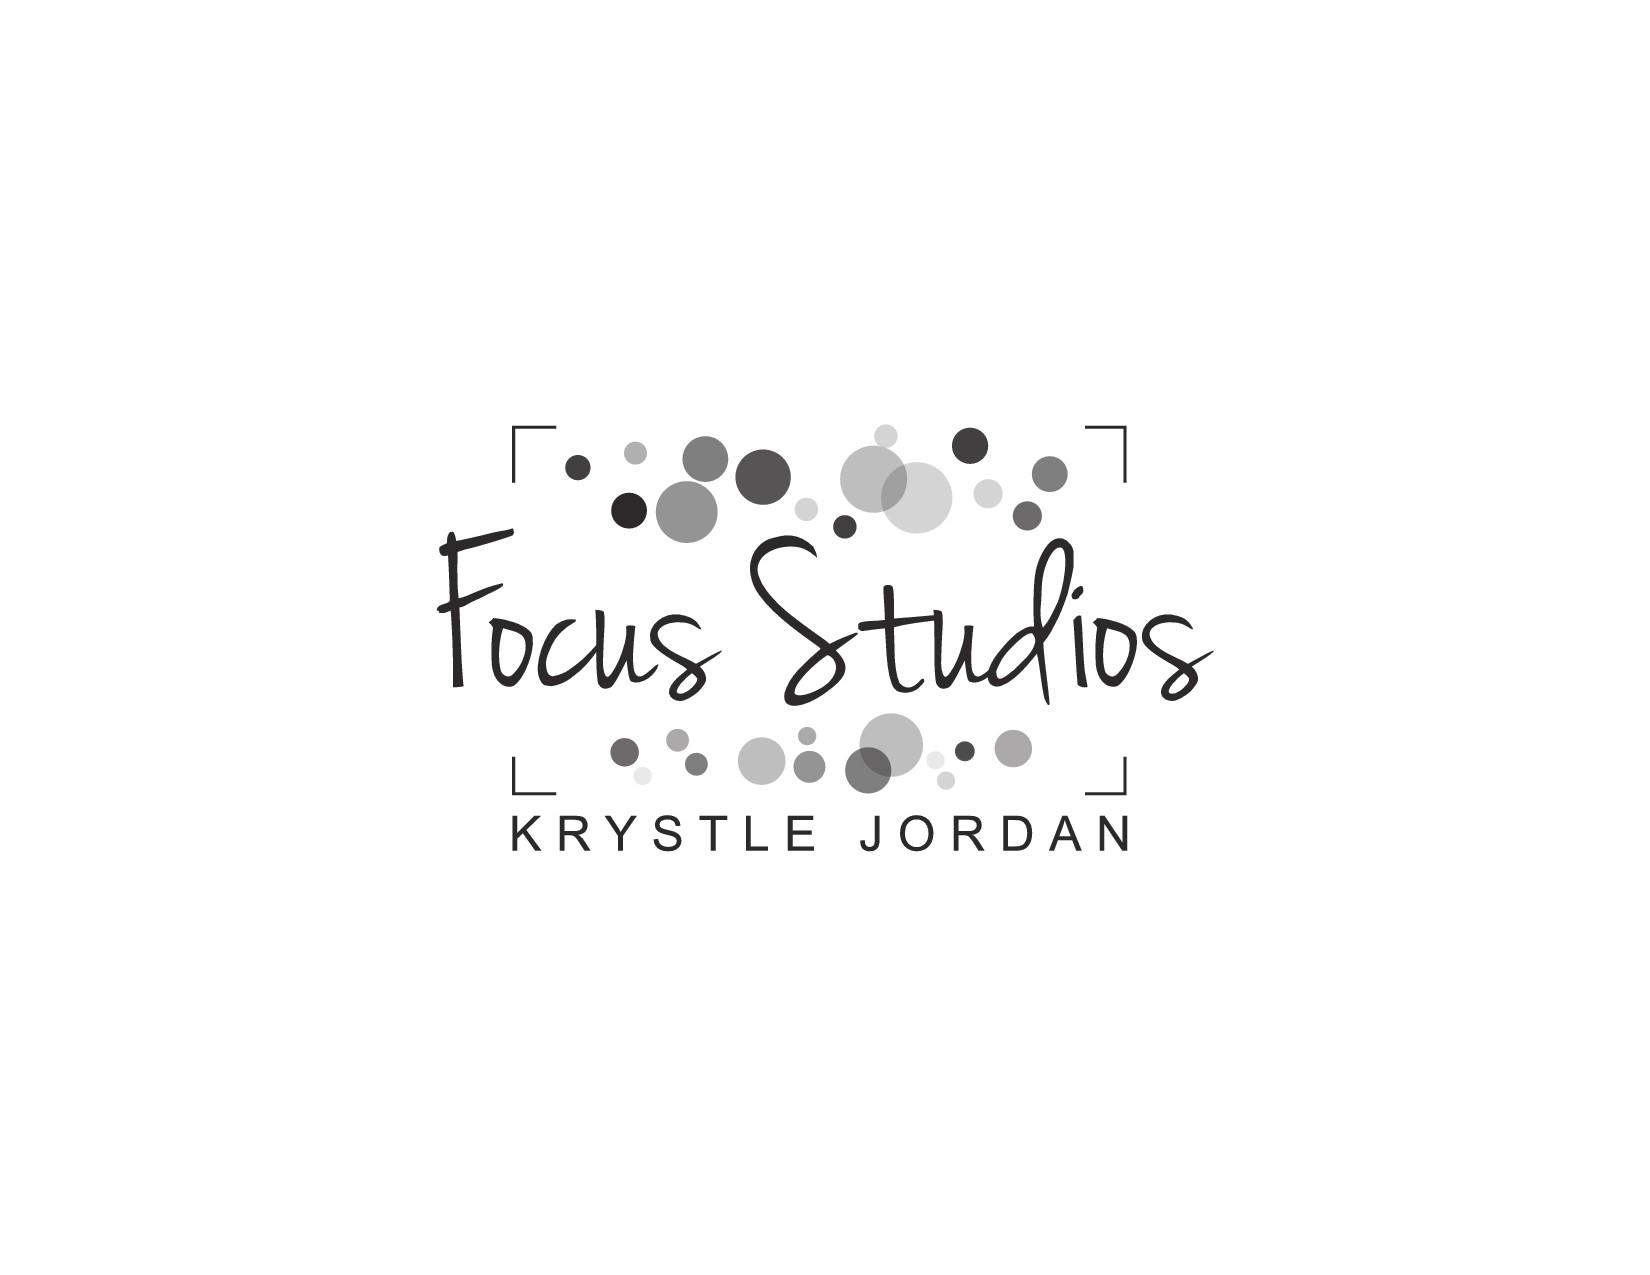 Design eye-catching photography logo for Focus Studios